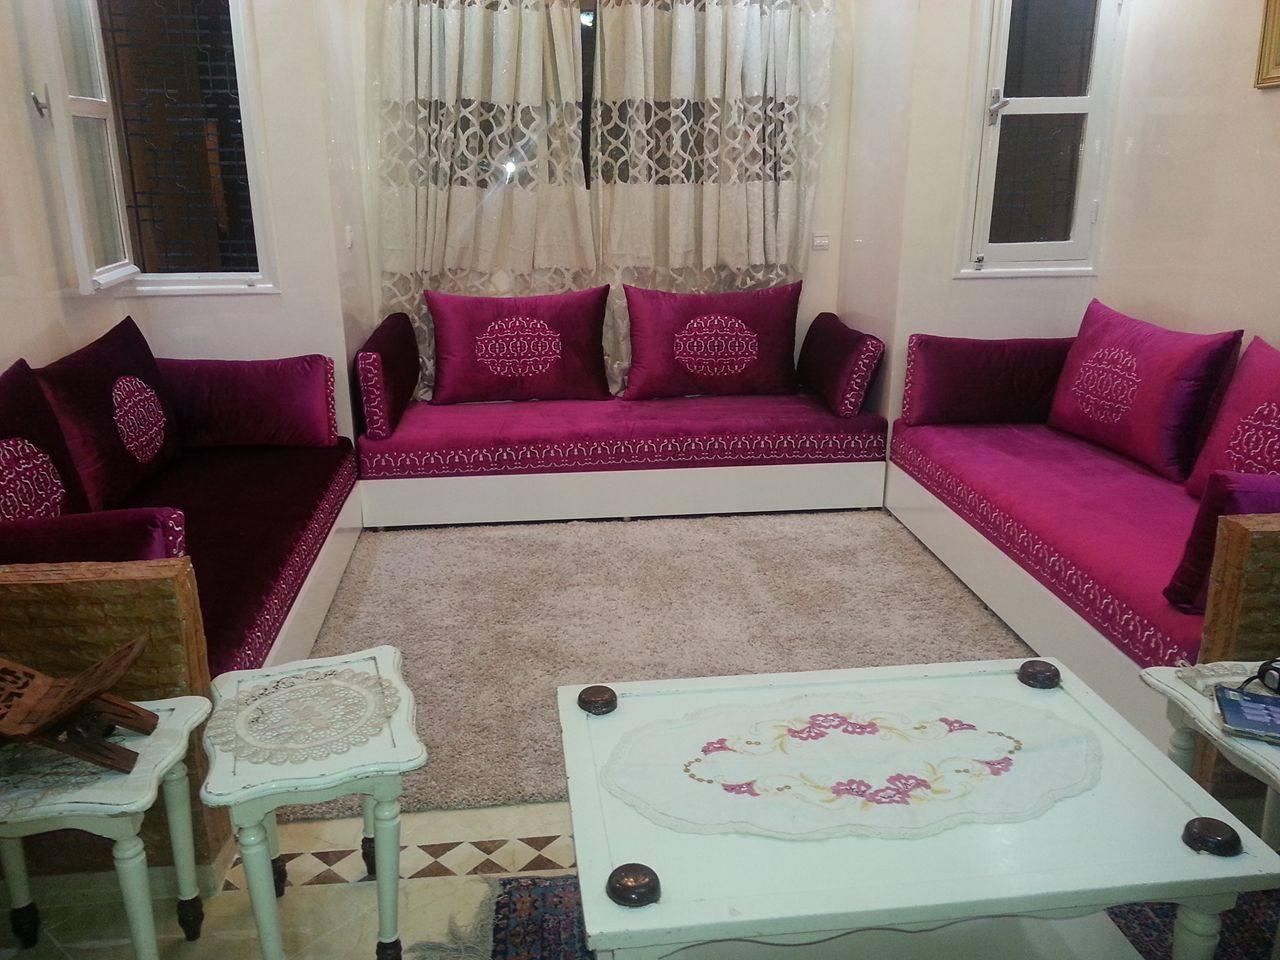 Avito Salon Marocain Casablanca   Fabrication Sur Mesure De Votre ...